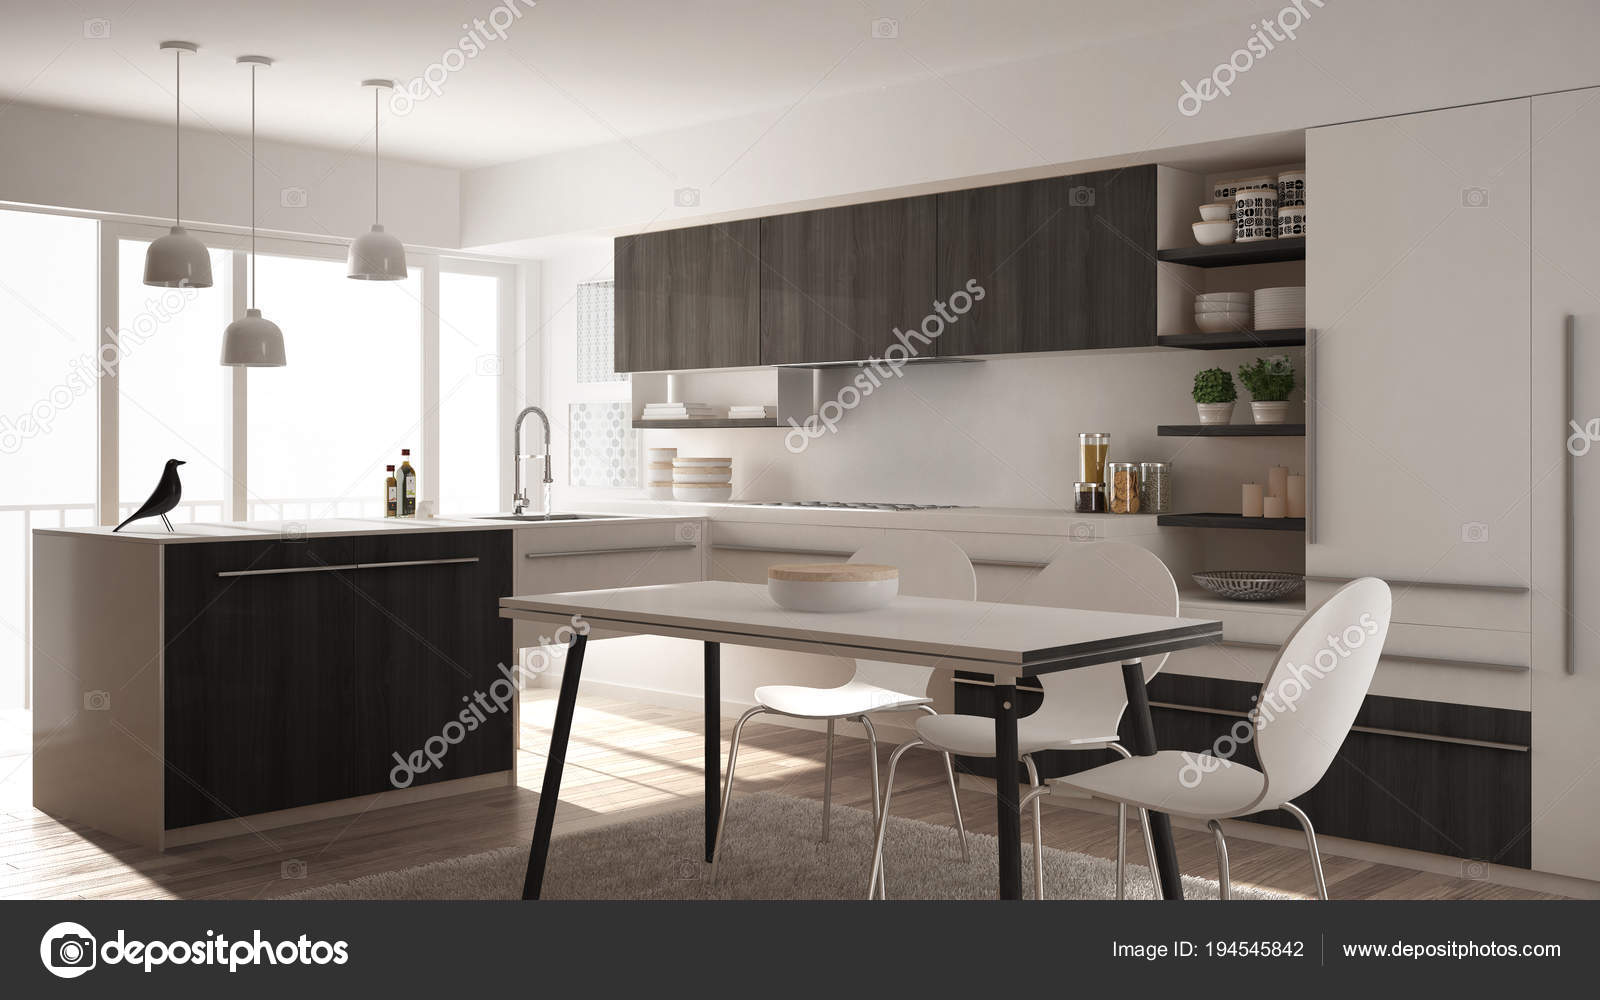 Cocina moderna de madera minimalista con mesa de comedor, alfombras ...